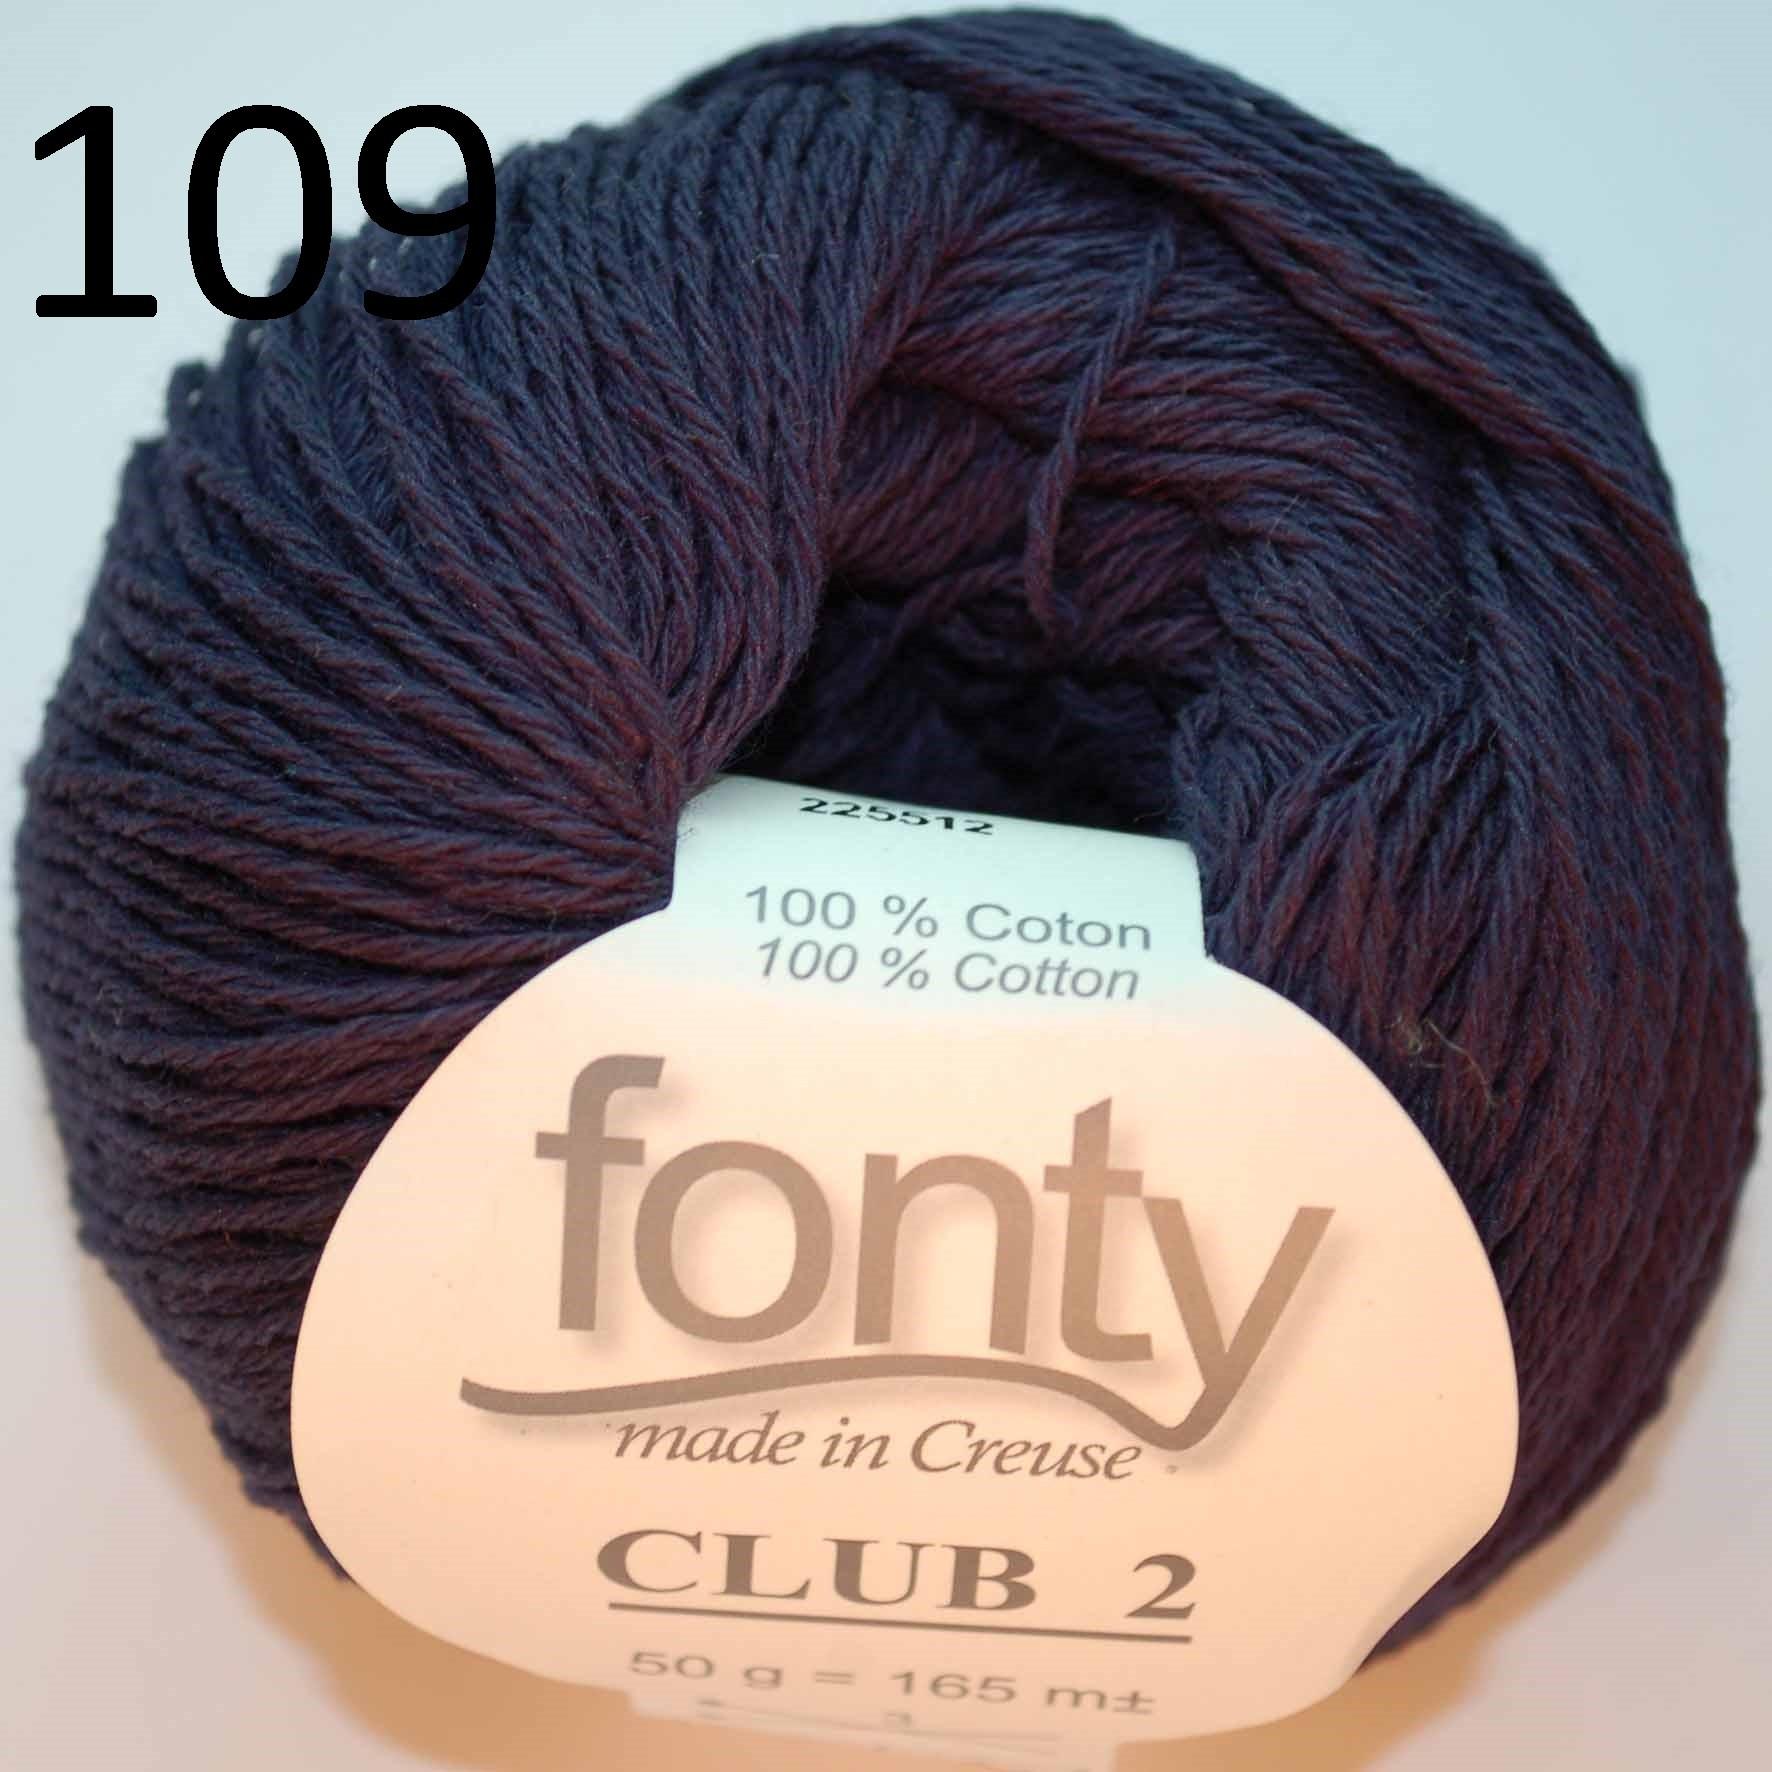 Club 2 109